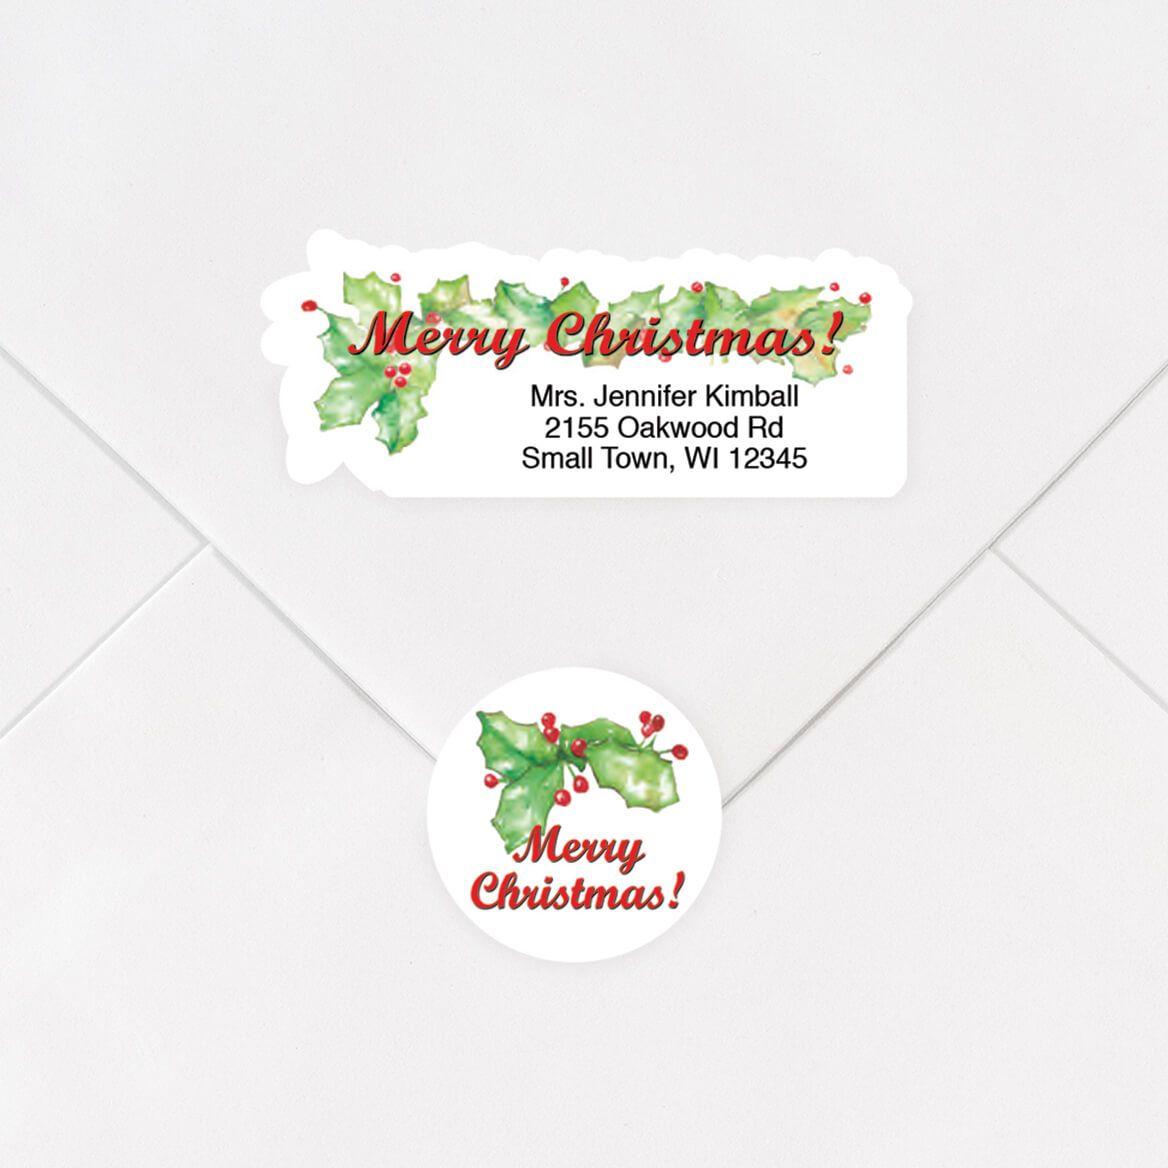 Merry Christmas Labels & Envelope Seals Set-325252